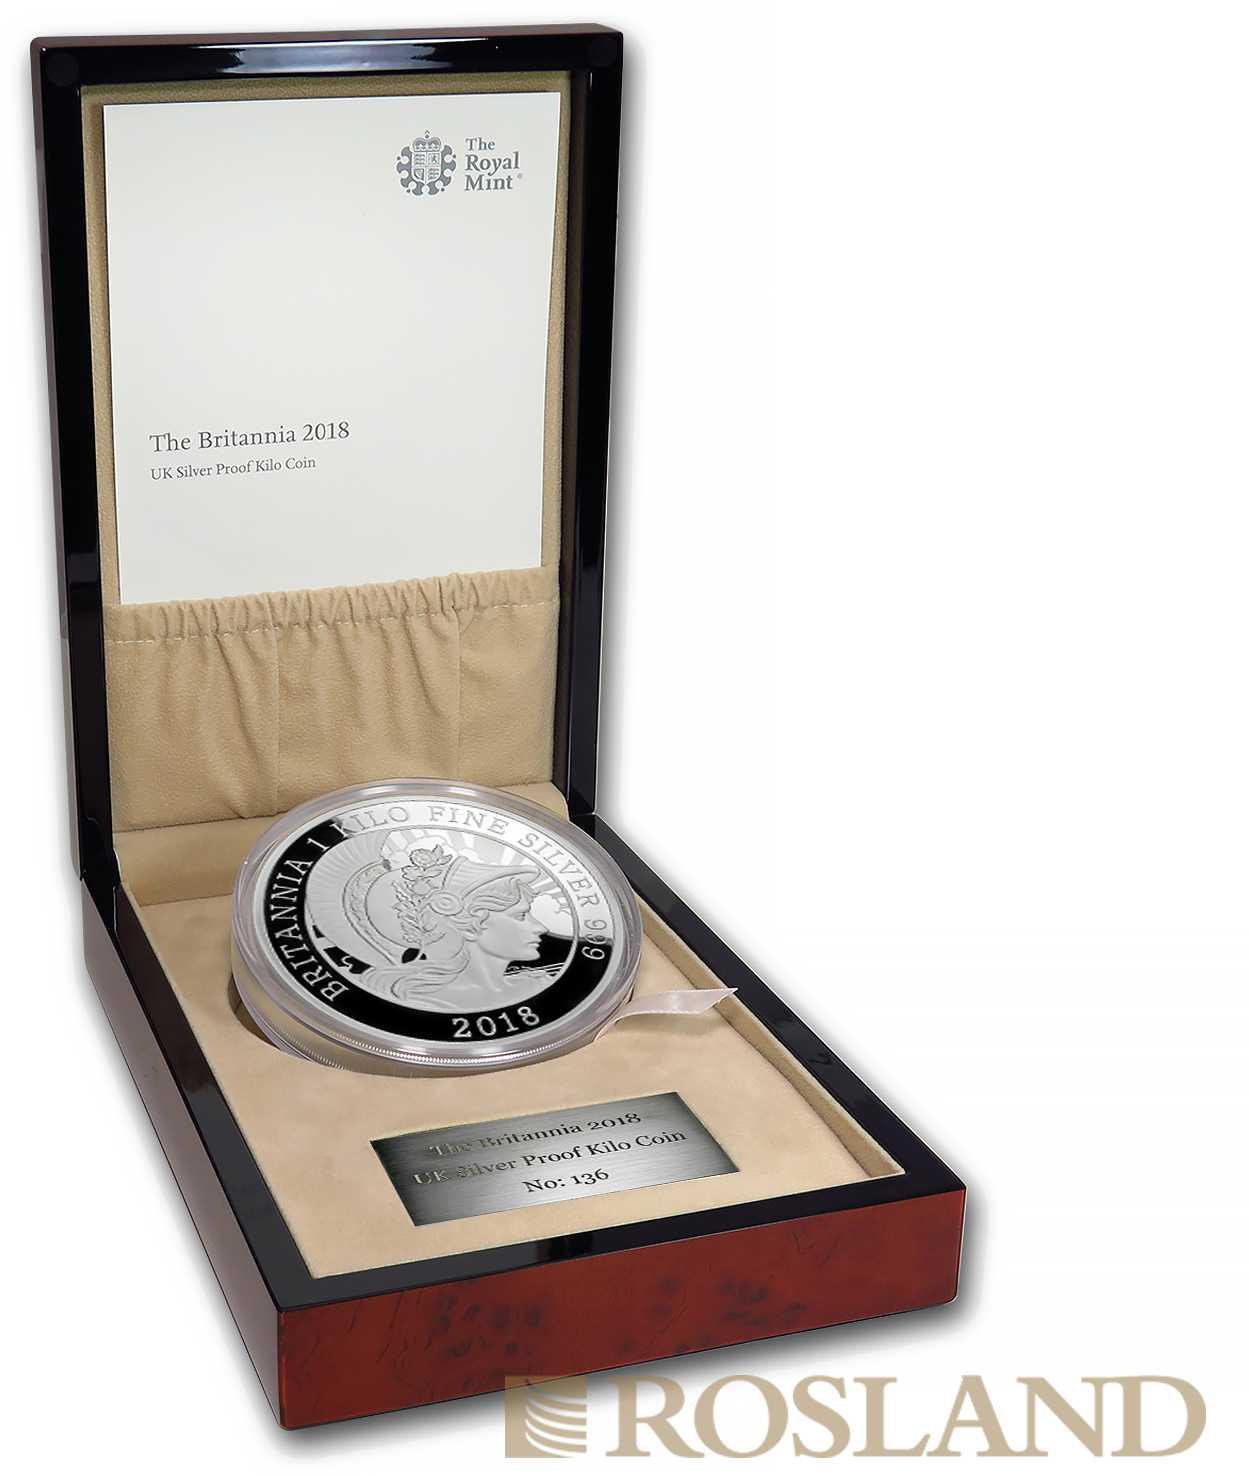 1 Kilogramm Silbermünze Brtiannia 2018 PP (Box, Zertifikat)